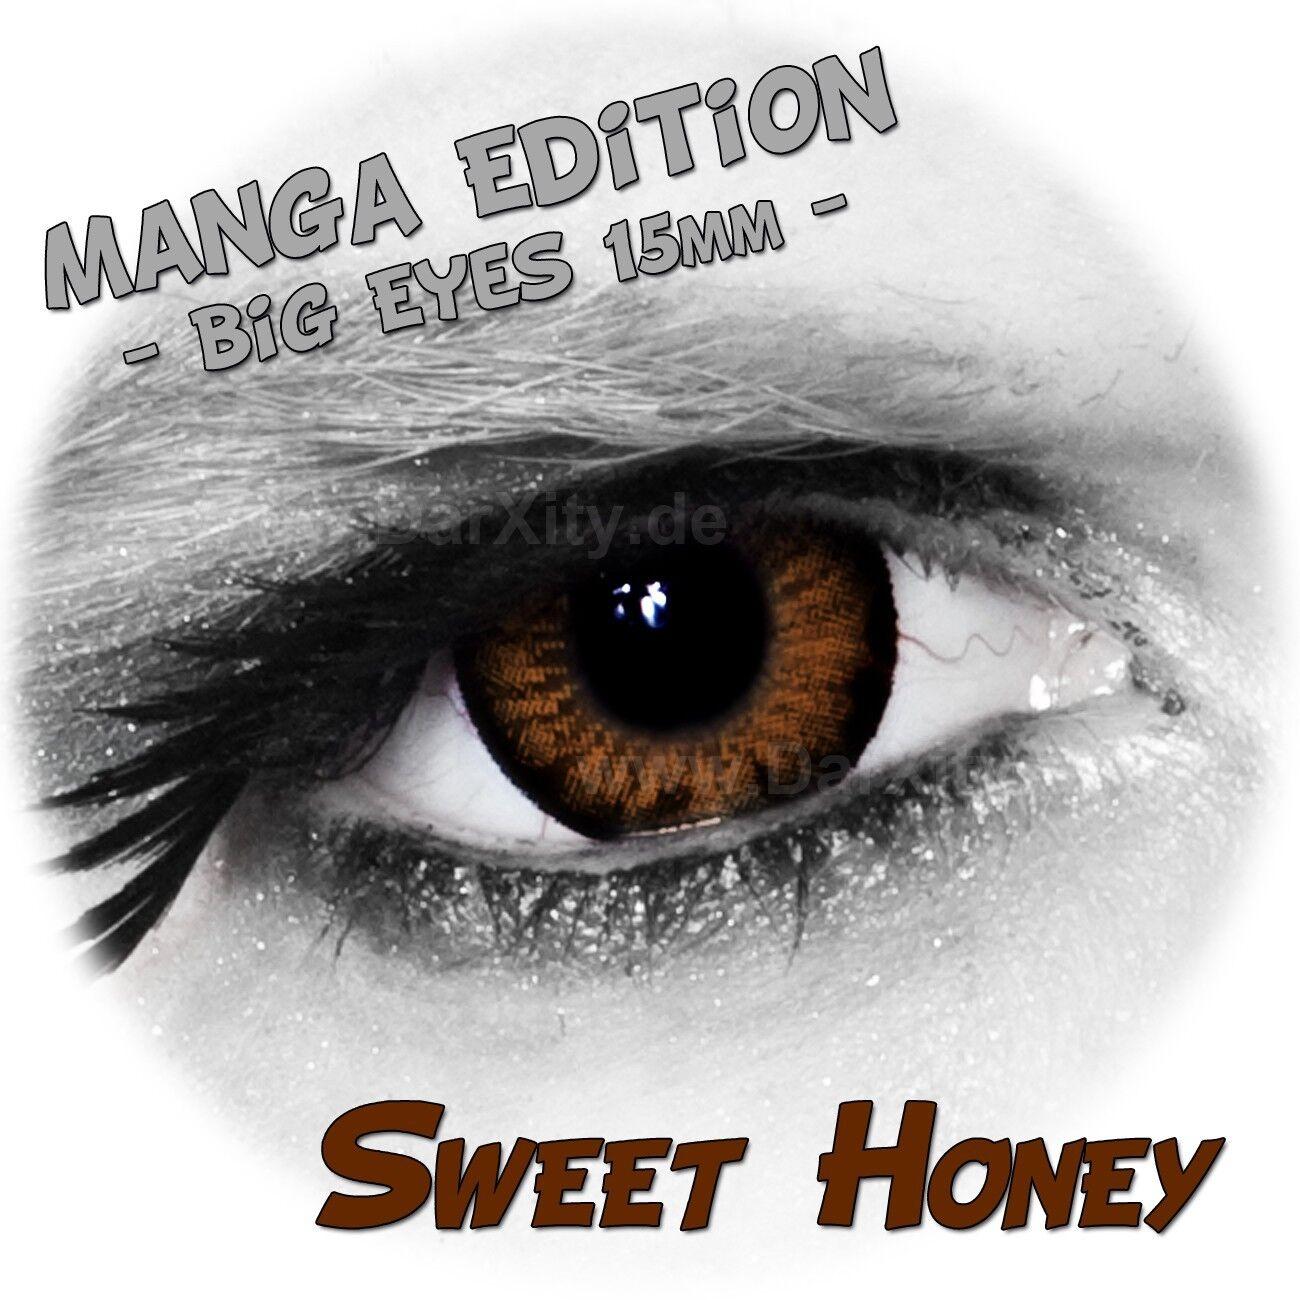 braune Manga Linsen, Big Eyes, Sweet Honey farbige Kontaktlinsen ohne Stärke